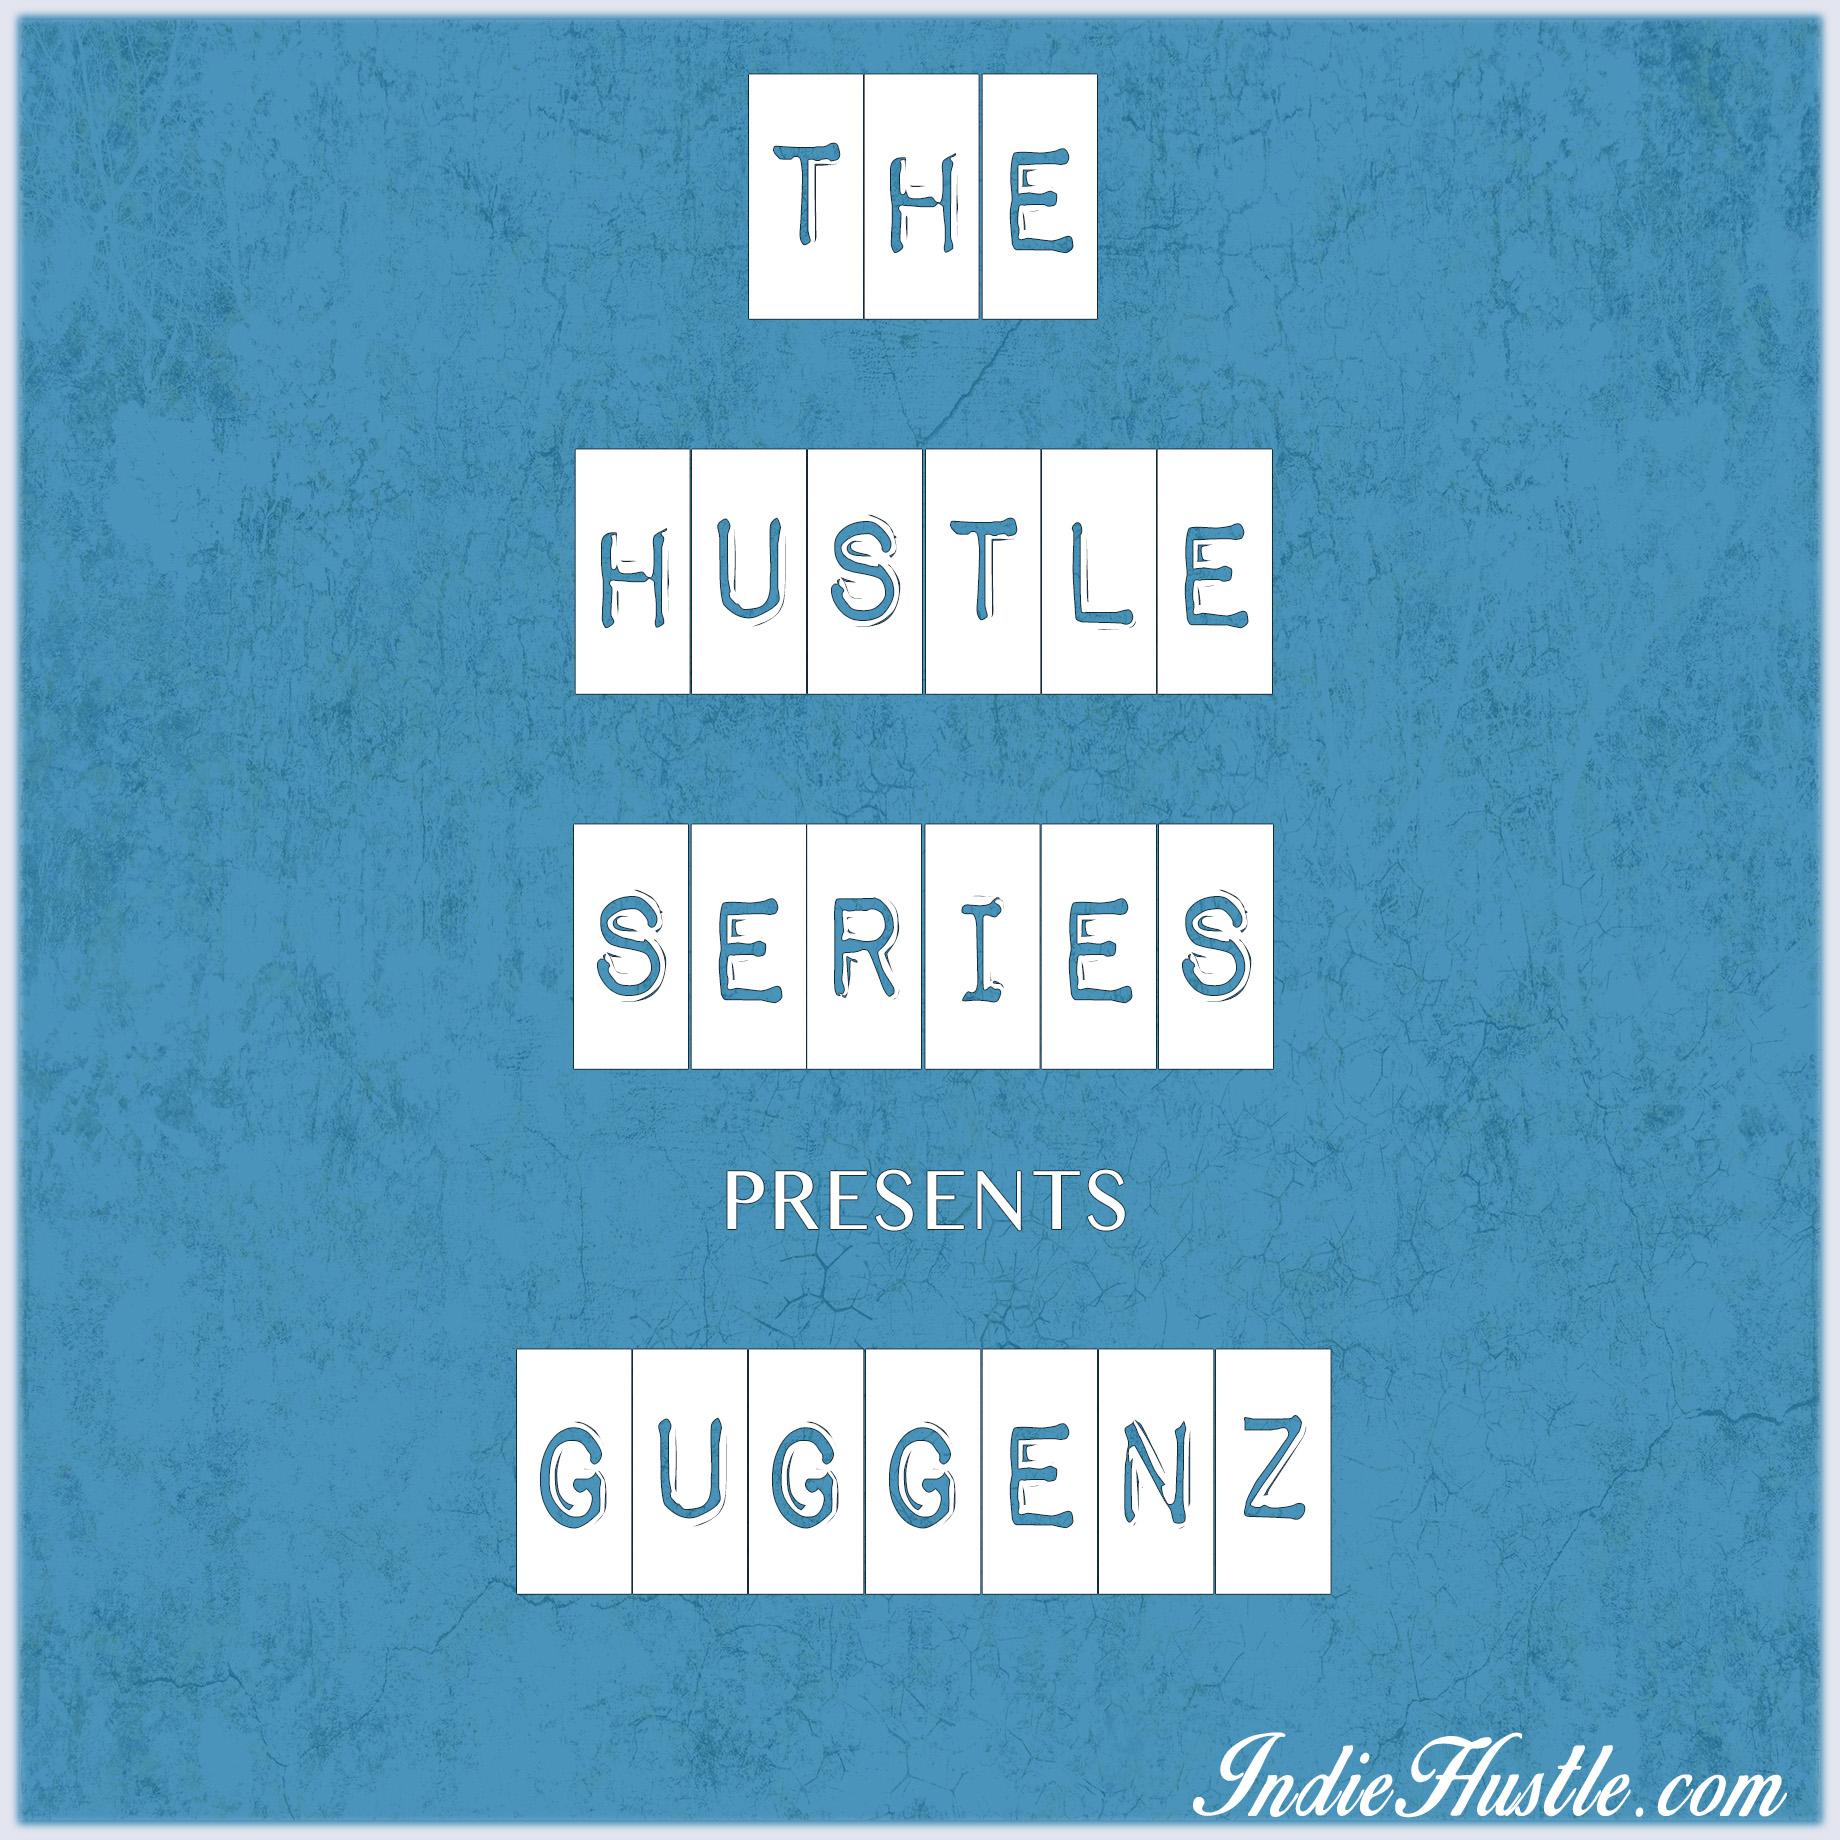 The Hustle Series: Guggenz